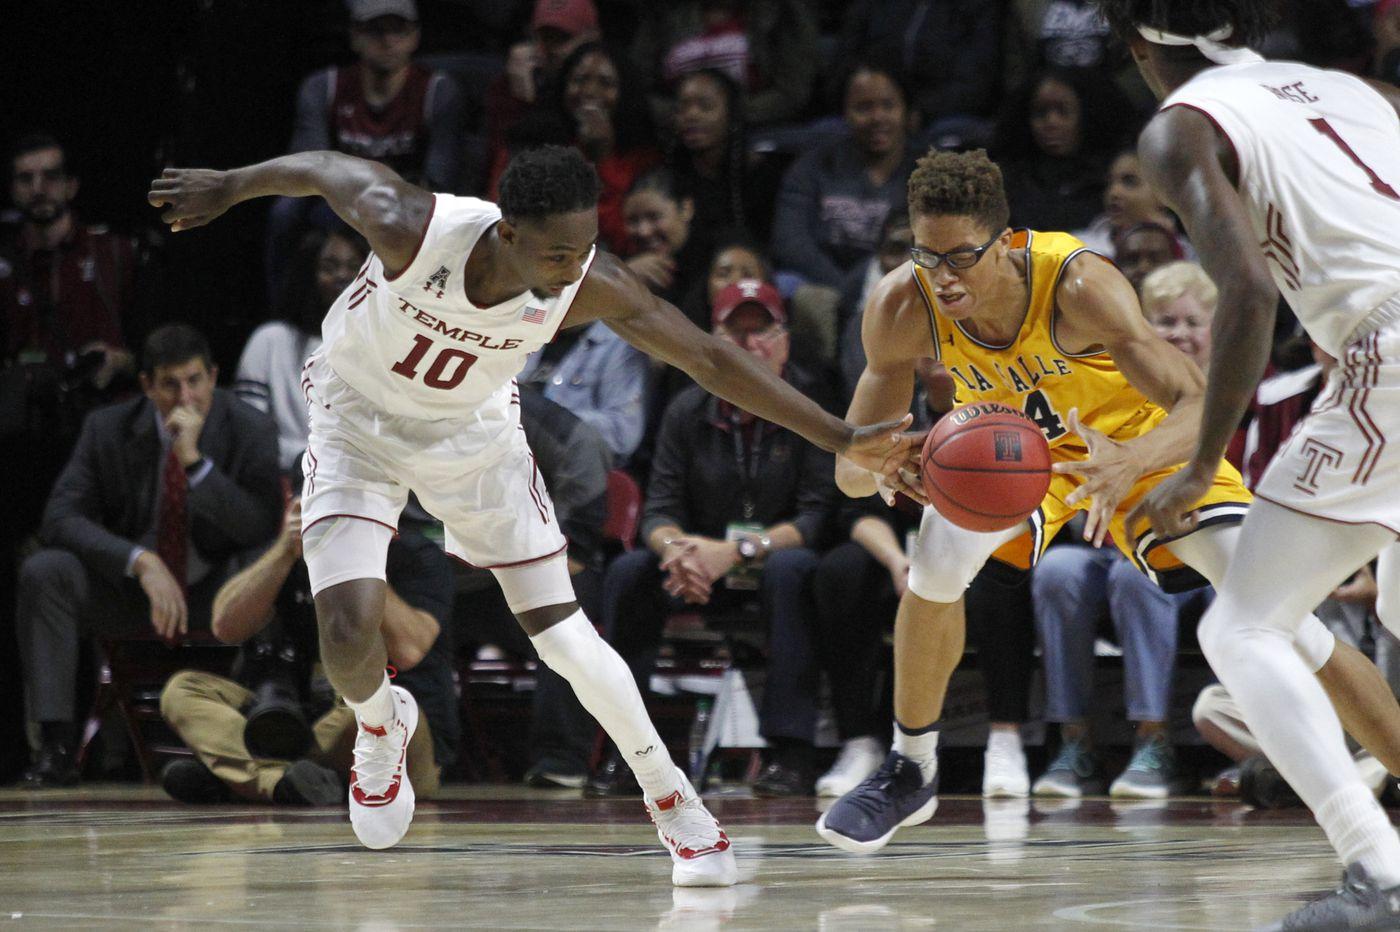 Temple beats La Salle in basketball opener, spoils Ashley Howard's debut